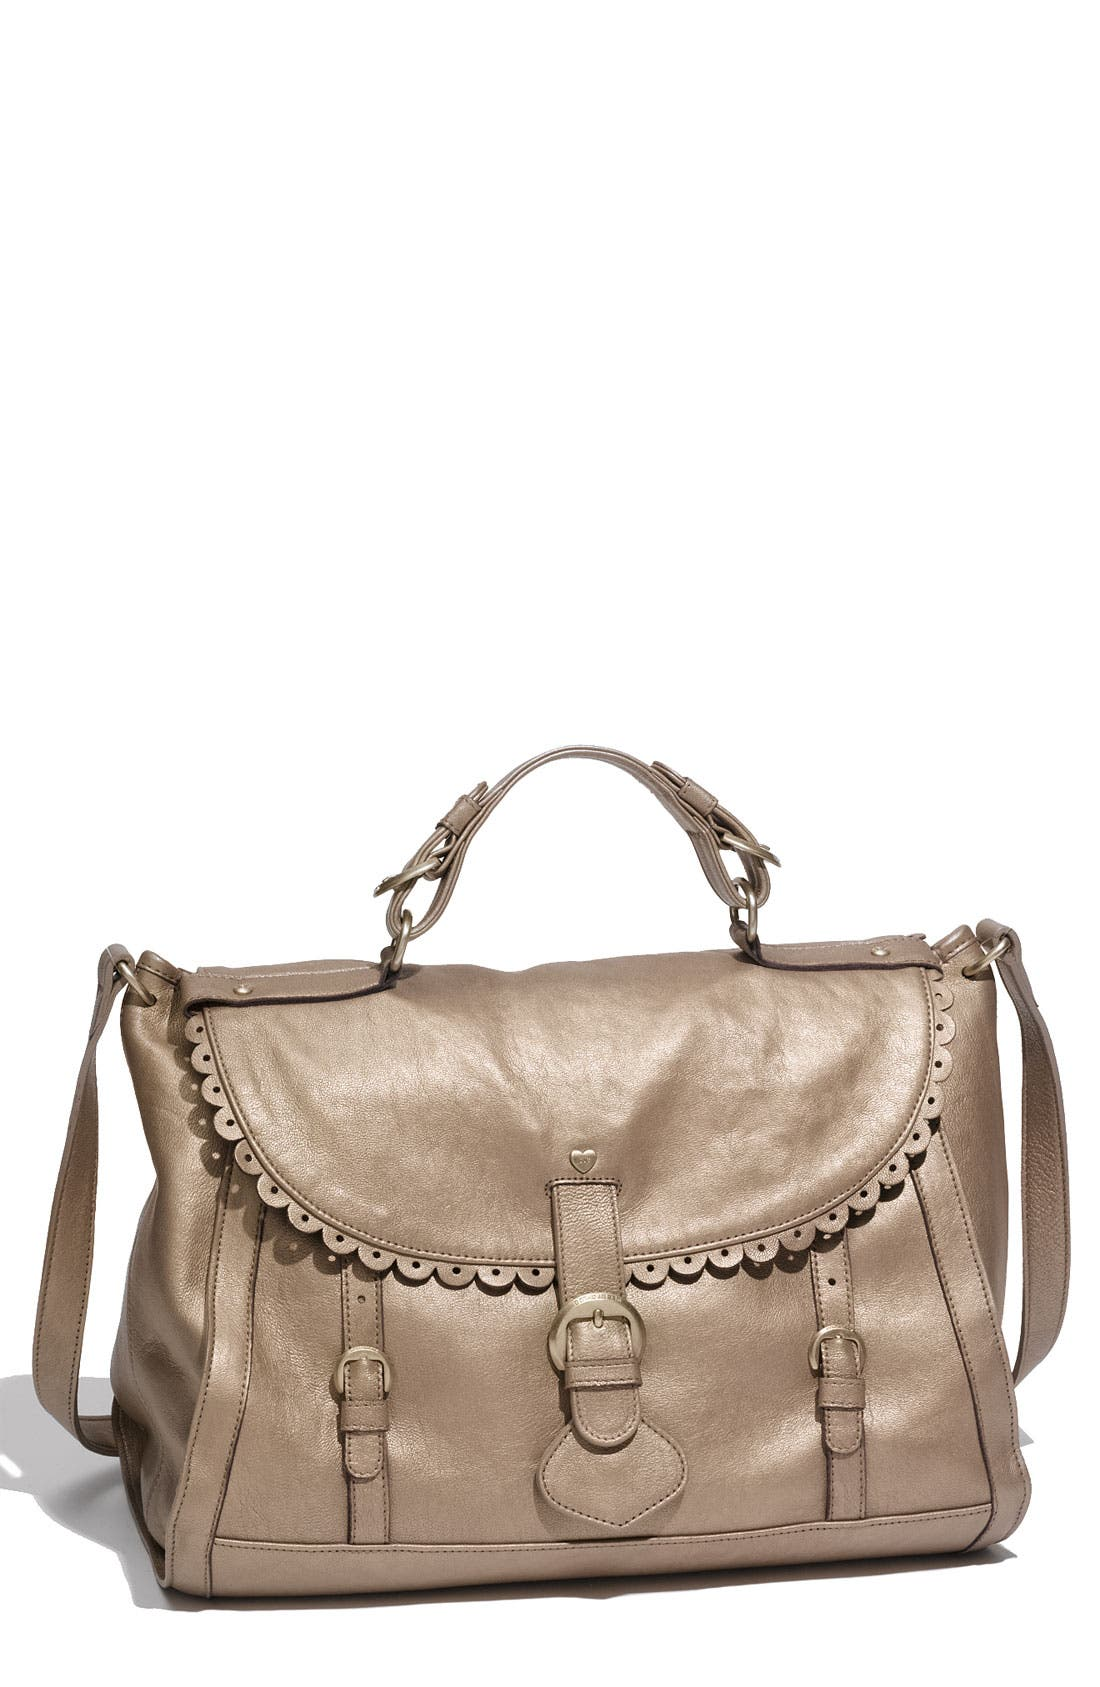 Alternate Image 1 Selected - See By Chloé 'Poya Vintage - Large' Metallic Leather Satchel